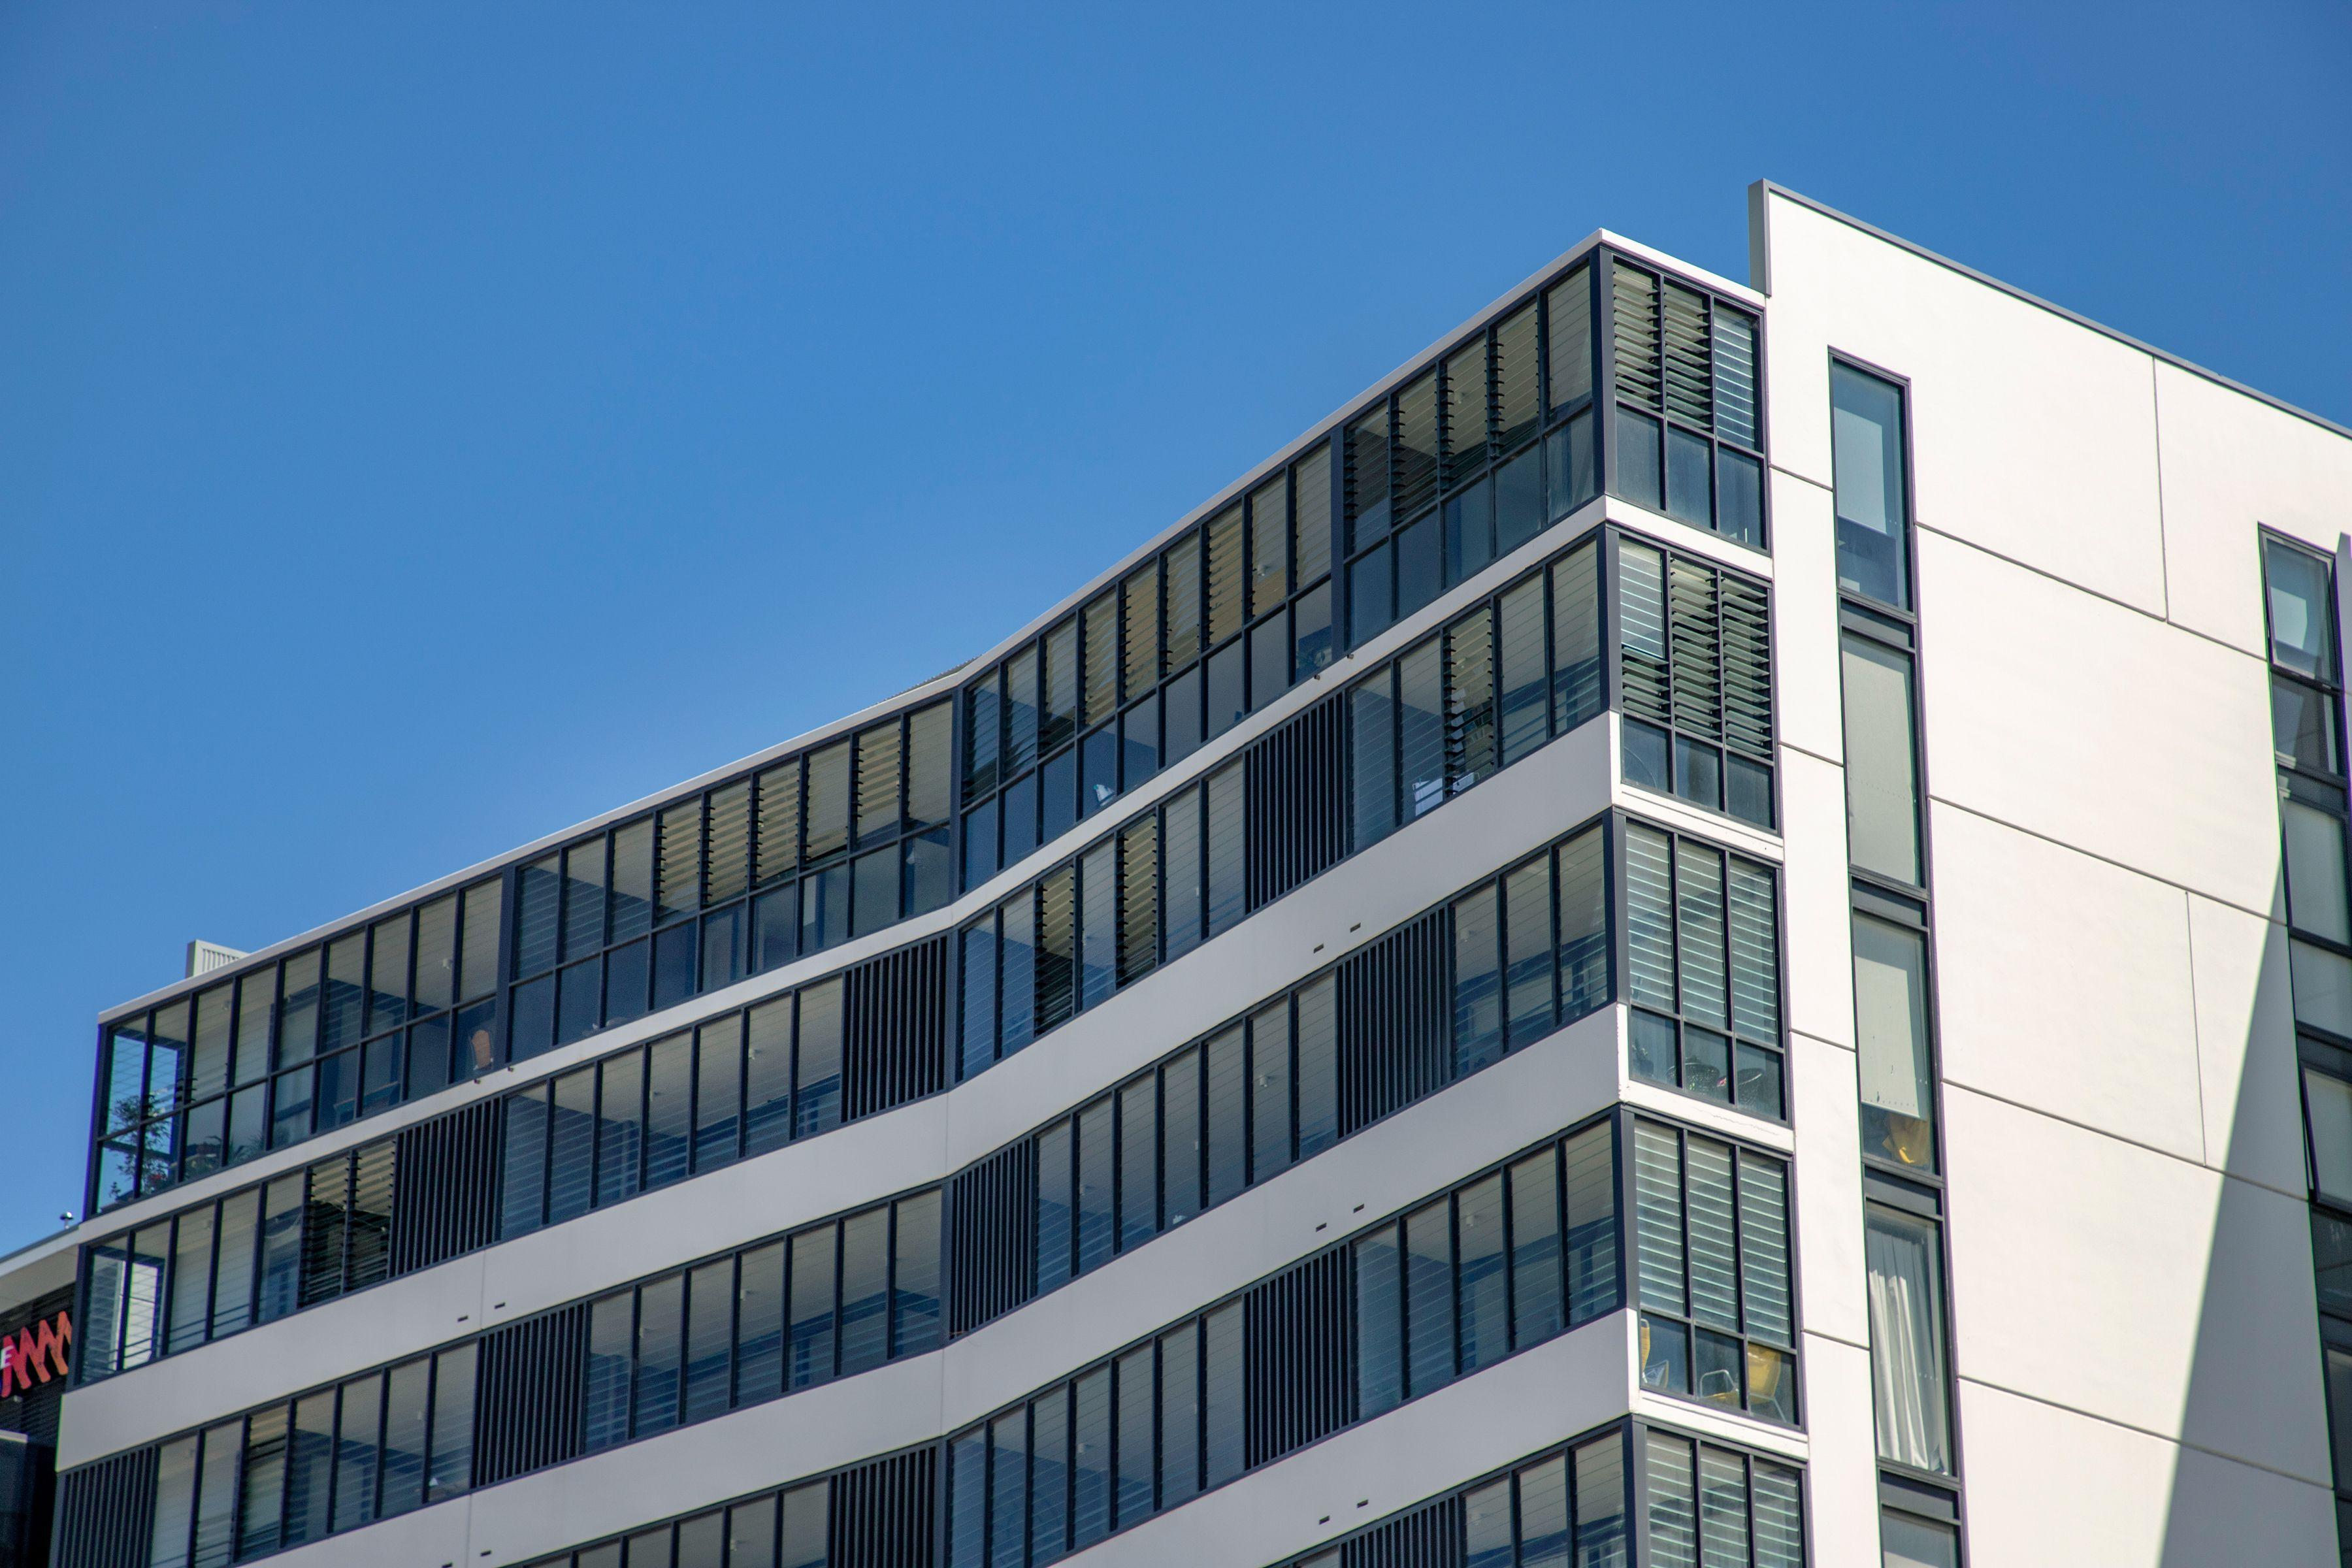 Level 7/709/10 Worth Place, Newcastle